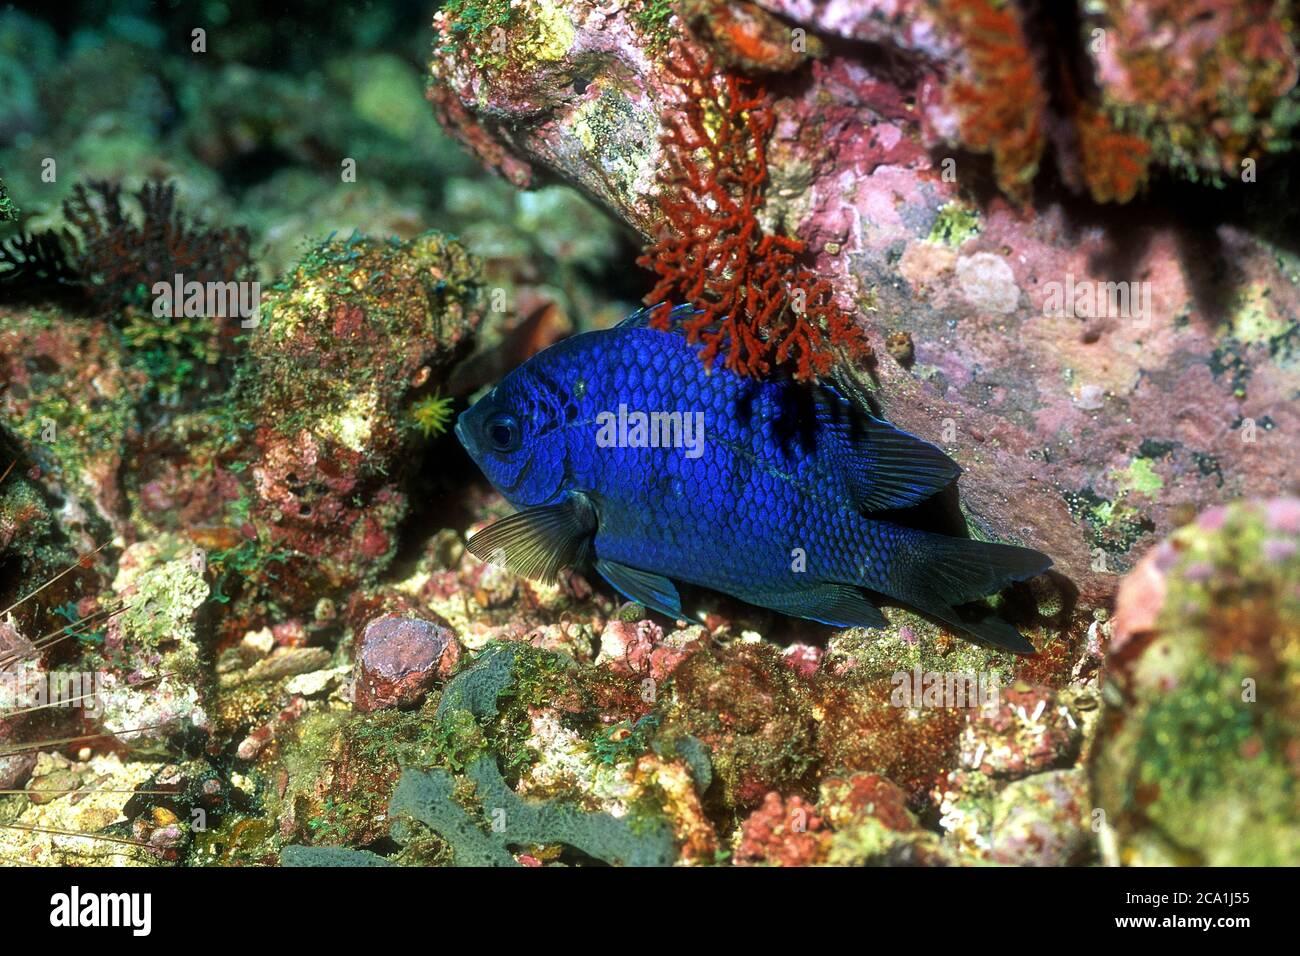 Azul Damegoísta, Cadenat's Chromis, 'Chromis cadenati', durmiente, corales cercanos, Isla Rolas, Santo Tomé Foto de stock